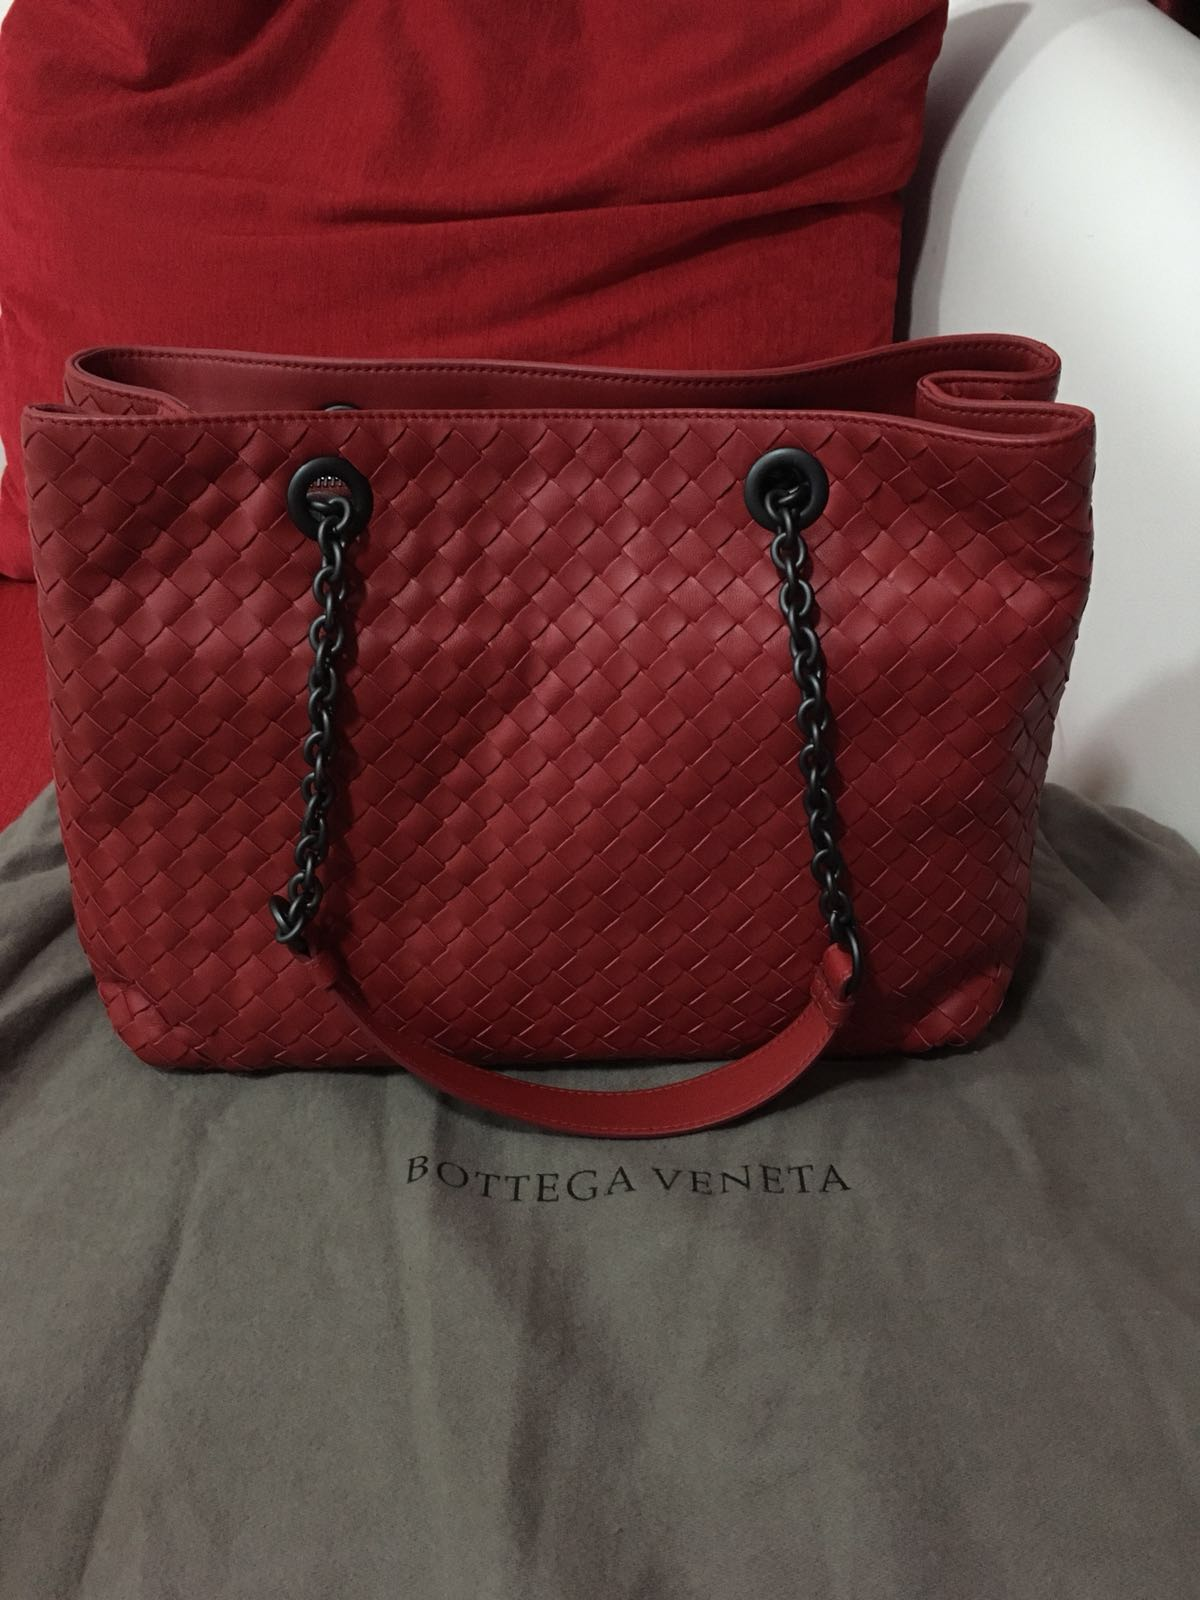 38557bfc588f Bottega Veneta Medium Tote Bag in Red   Vesuvio Intrecciato Nappa ...